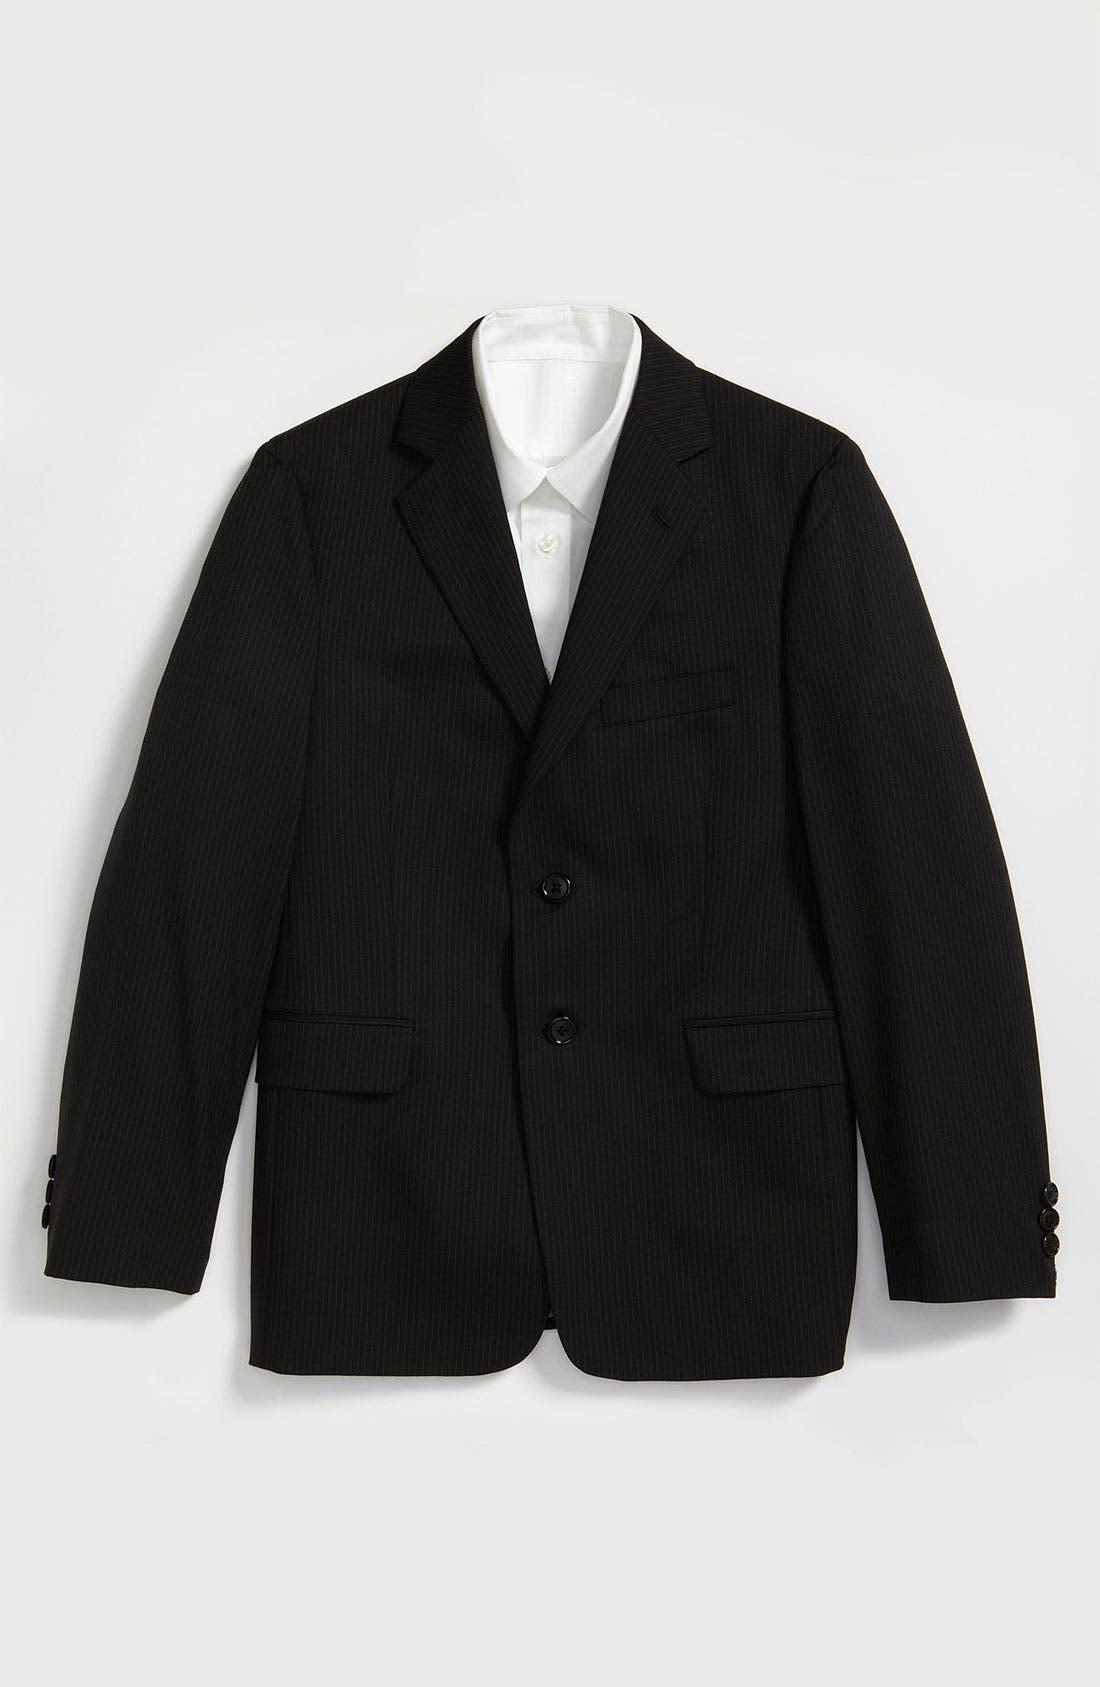 Main Image - Joseph Abboud Pinstripe Suit Jacket (Big Boys)